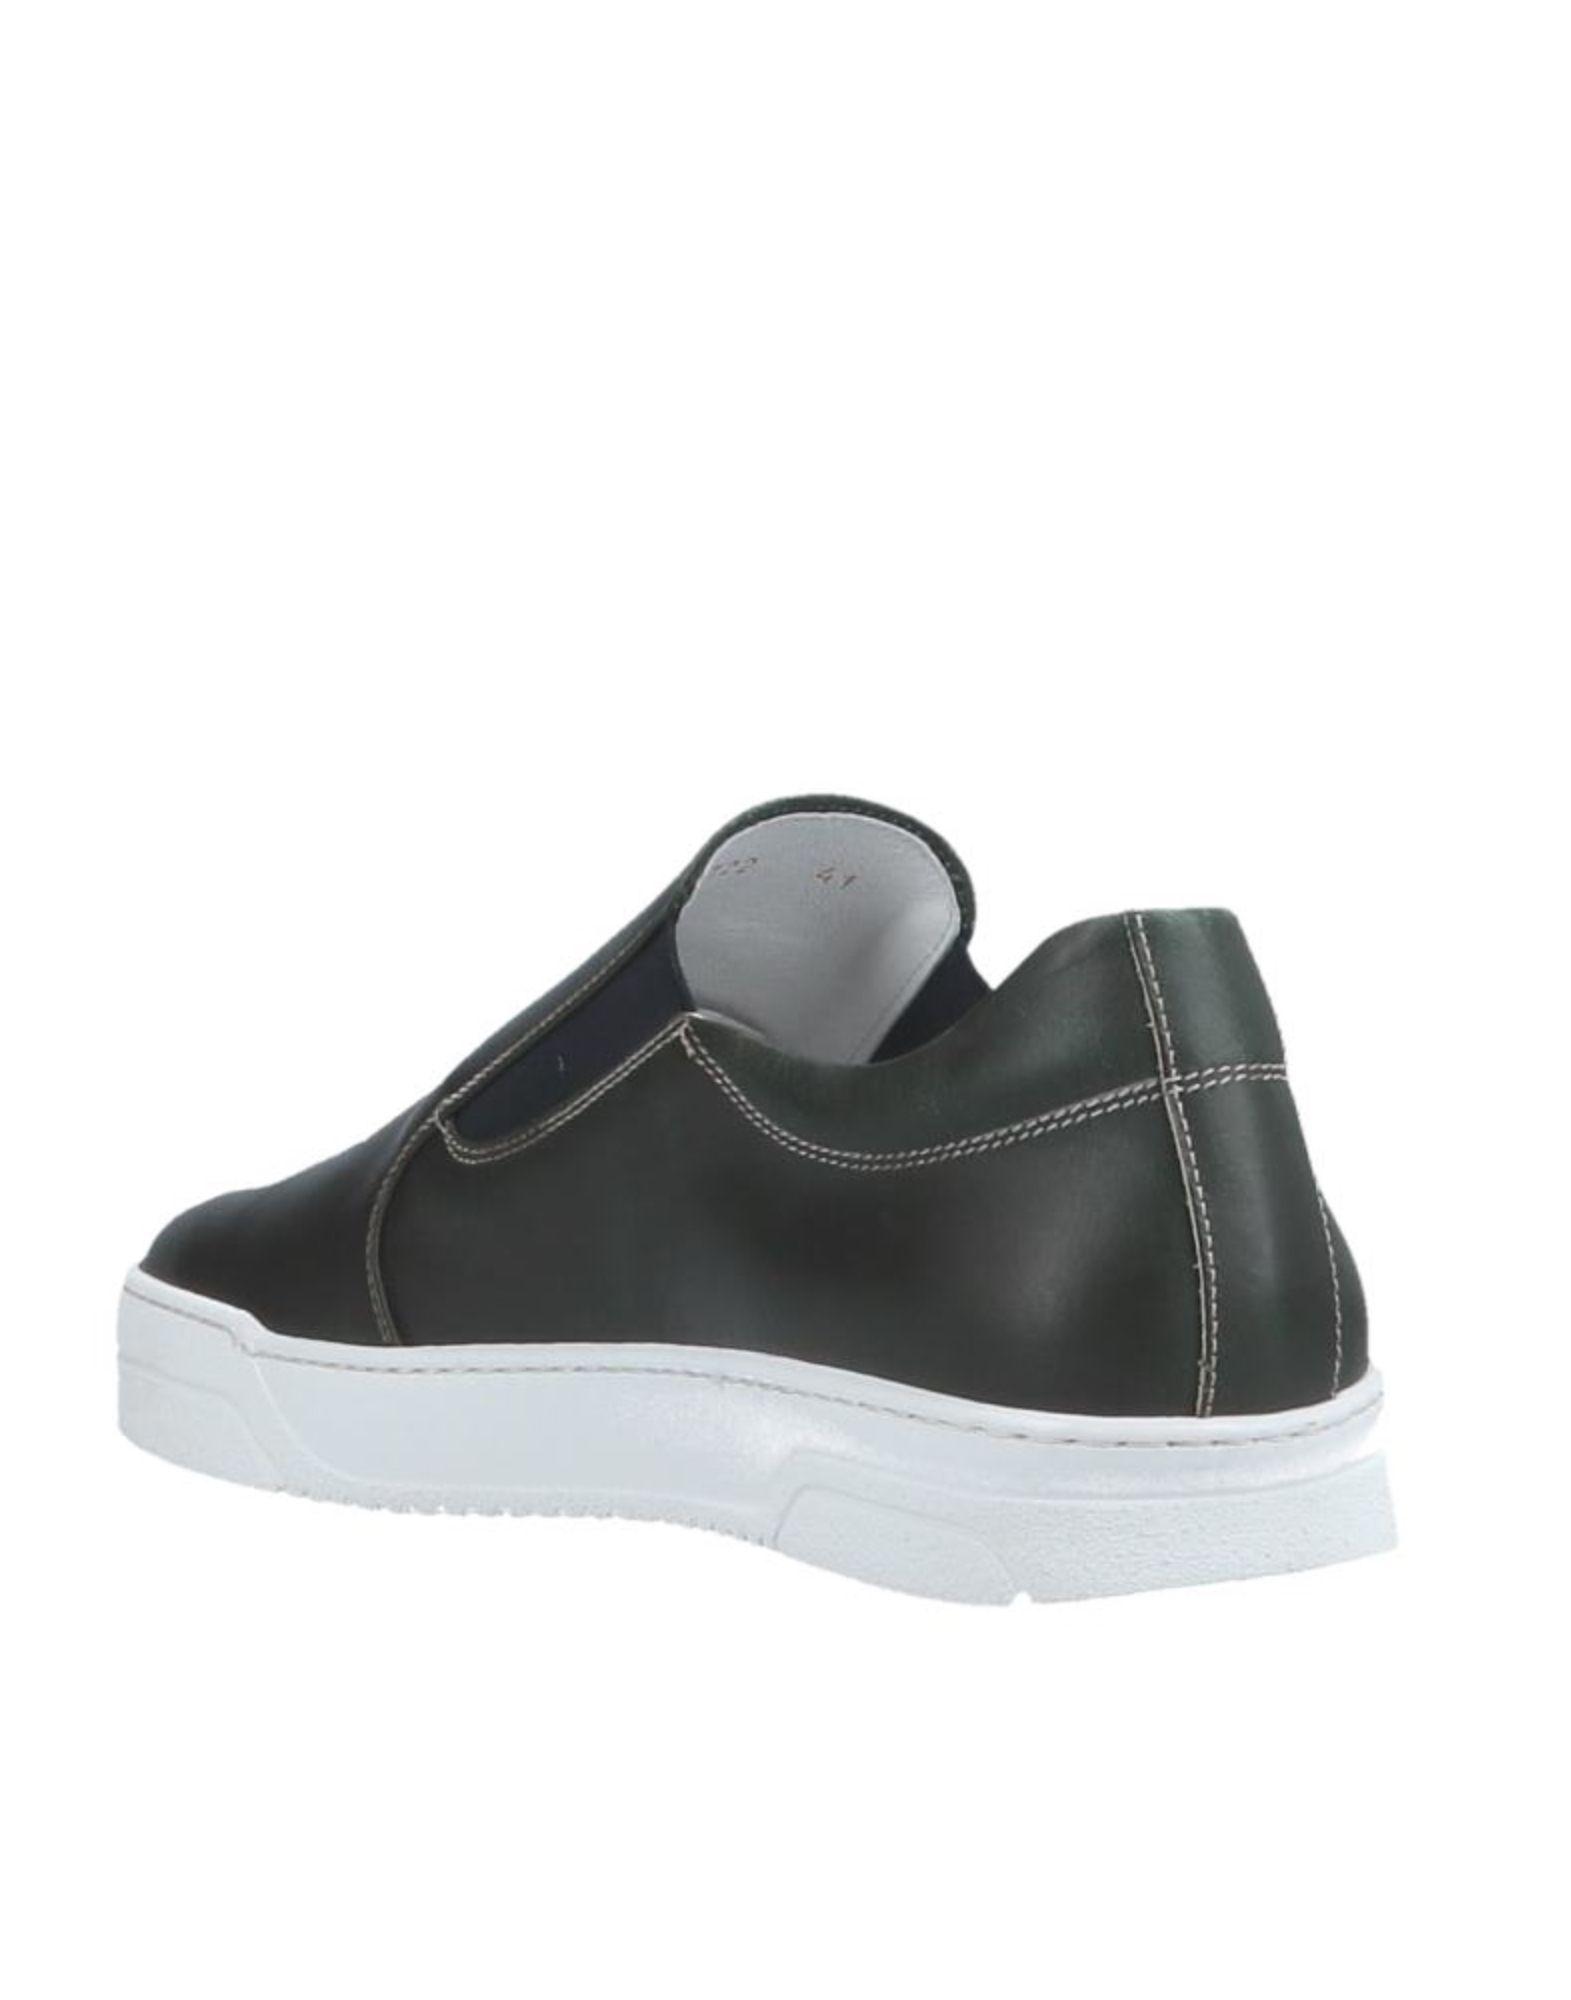 Gianfranco Lattanzi Sneakers Herren  11510509CR Gute Qualität beliebte beliebte beliebte Schuhe 7b1851